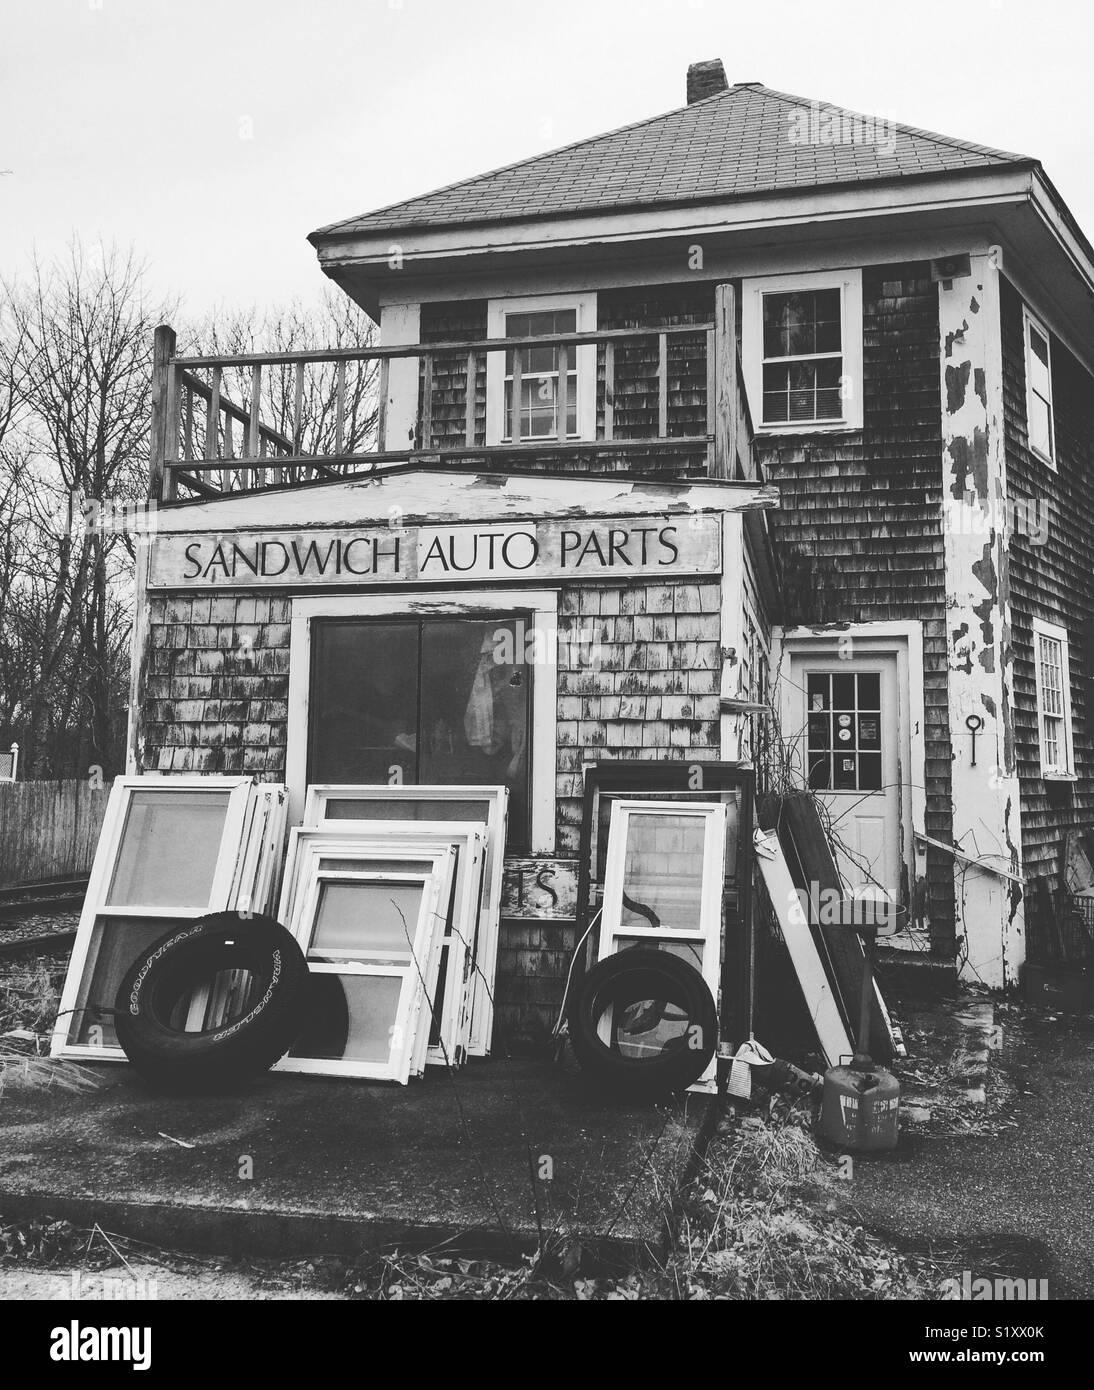 Pièces Auto Sandwich, Sandwich, Cape Cod, Massachusetts, United States Photo Stock